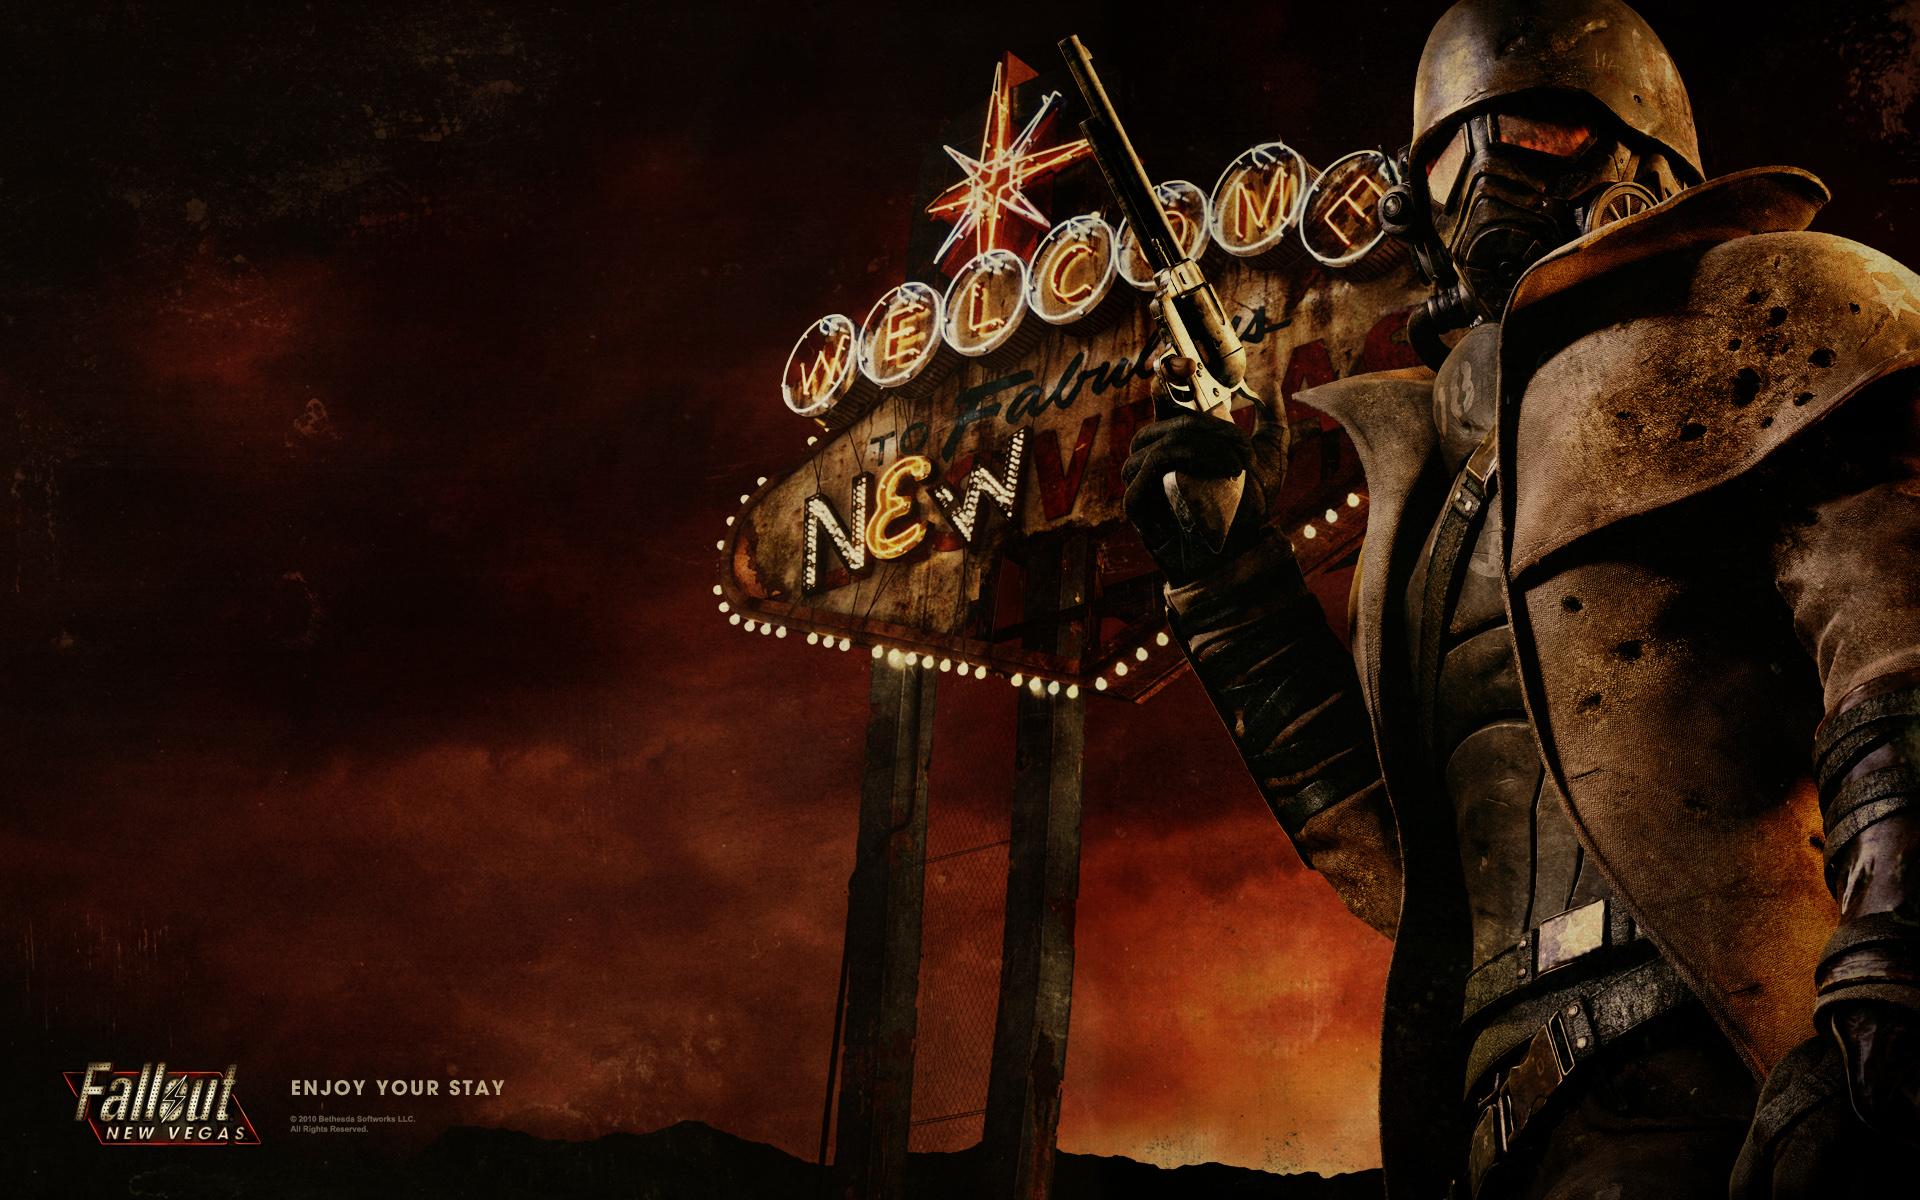 Great Wallpaper Logo Fallout 4 - fallout-new-vegas-wallpaper-3-welcome-sign  2018_712215.jpg